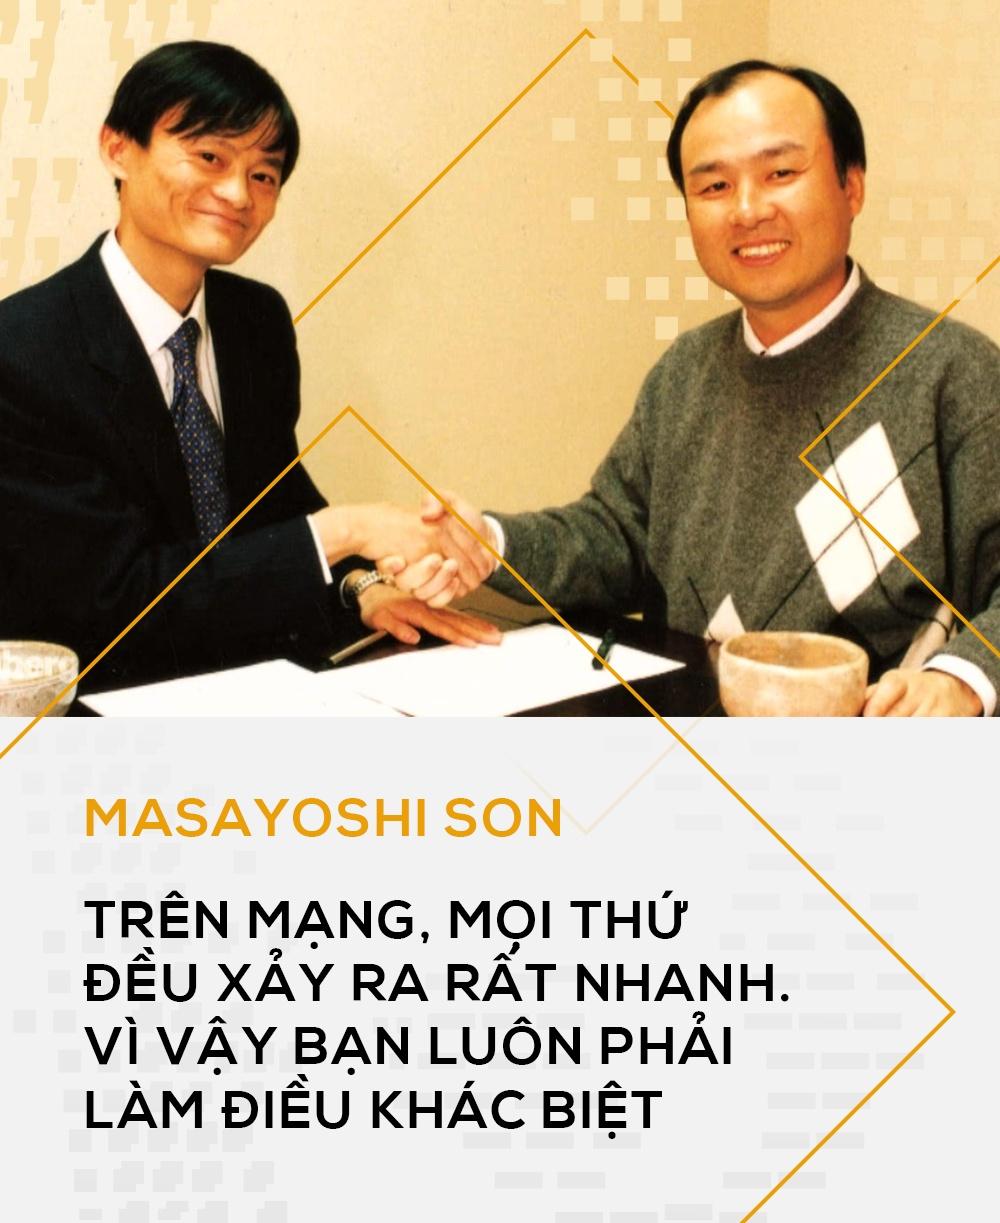 Masayoshi Son - ong trum dang sau nhung de che cong nghe hinh anh 13